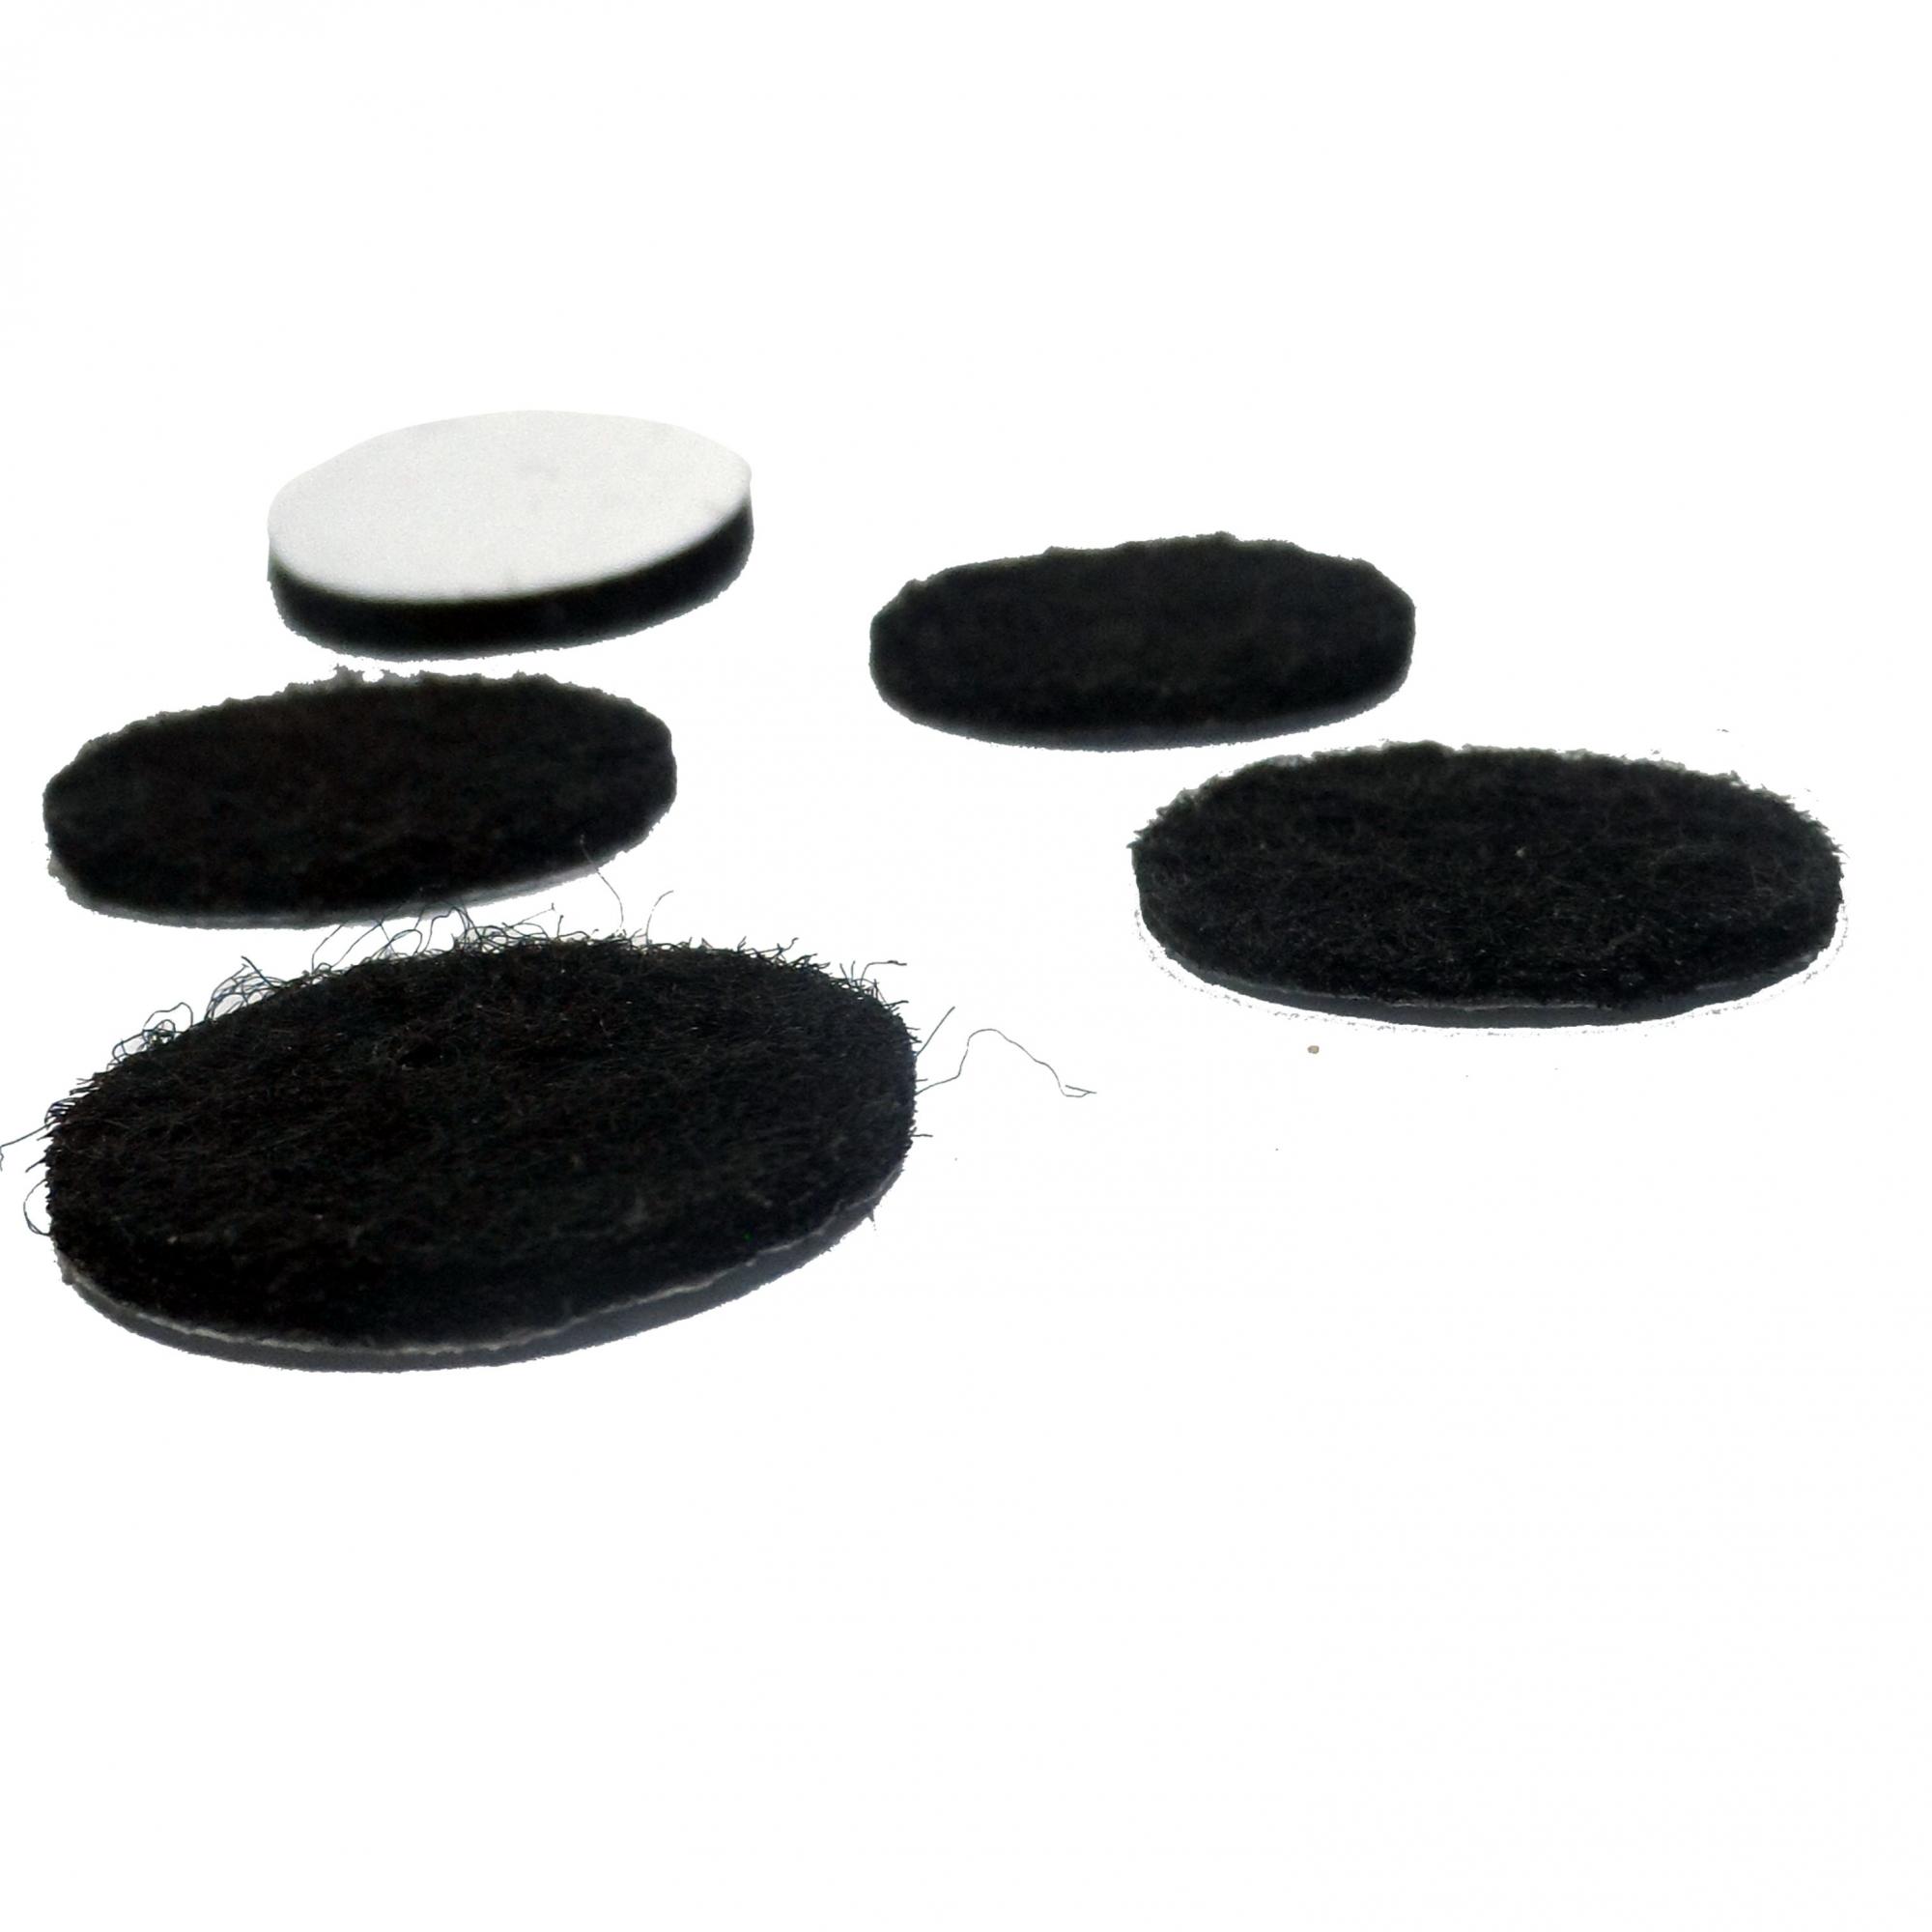 Kit 100 Carpete Proteção Adesivo Preto Redondo Móveis 2cm